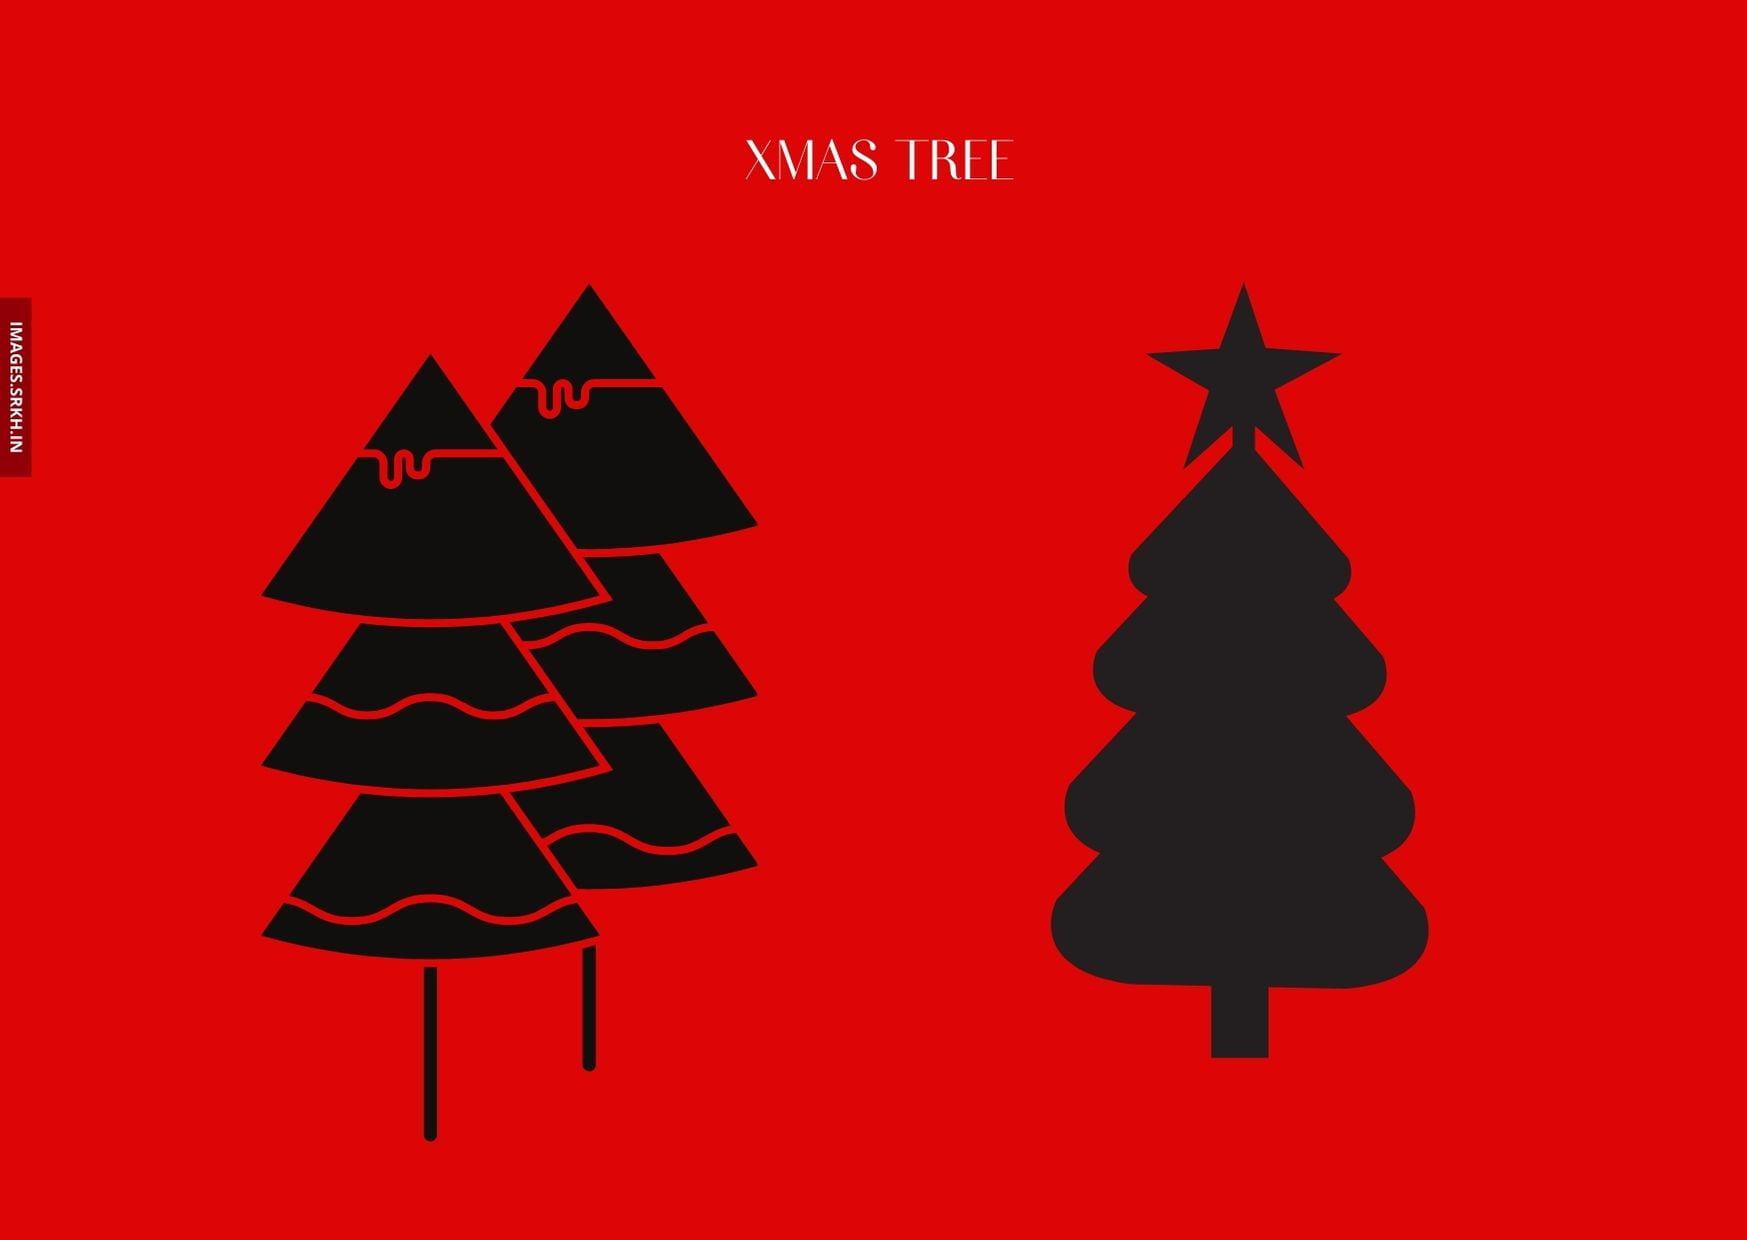 Xmas Tree Drawing Images full HD free download.